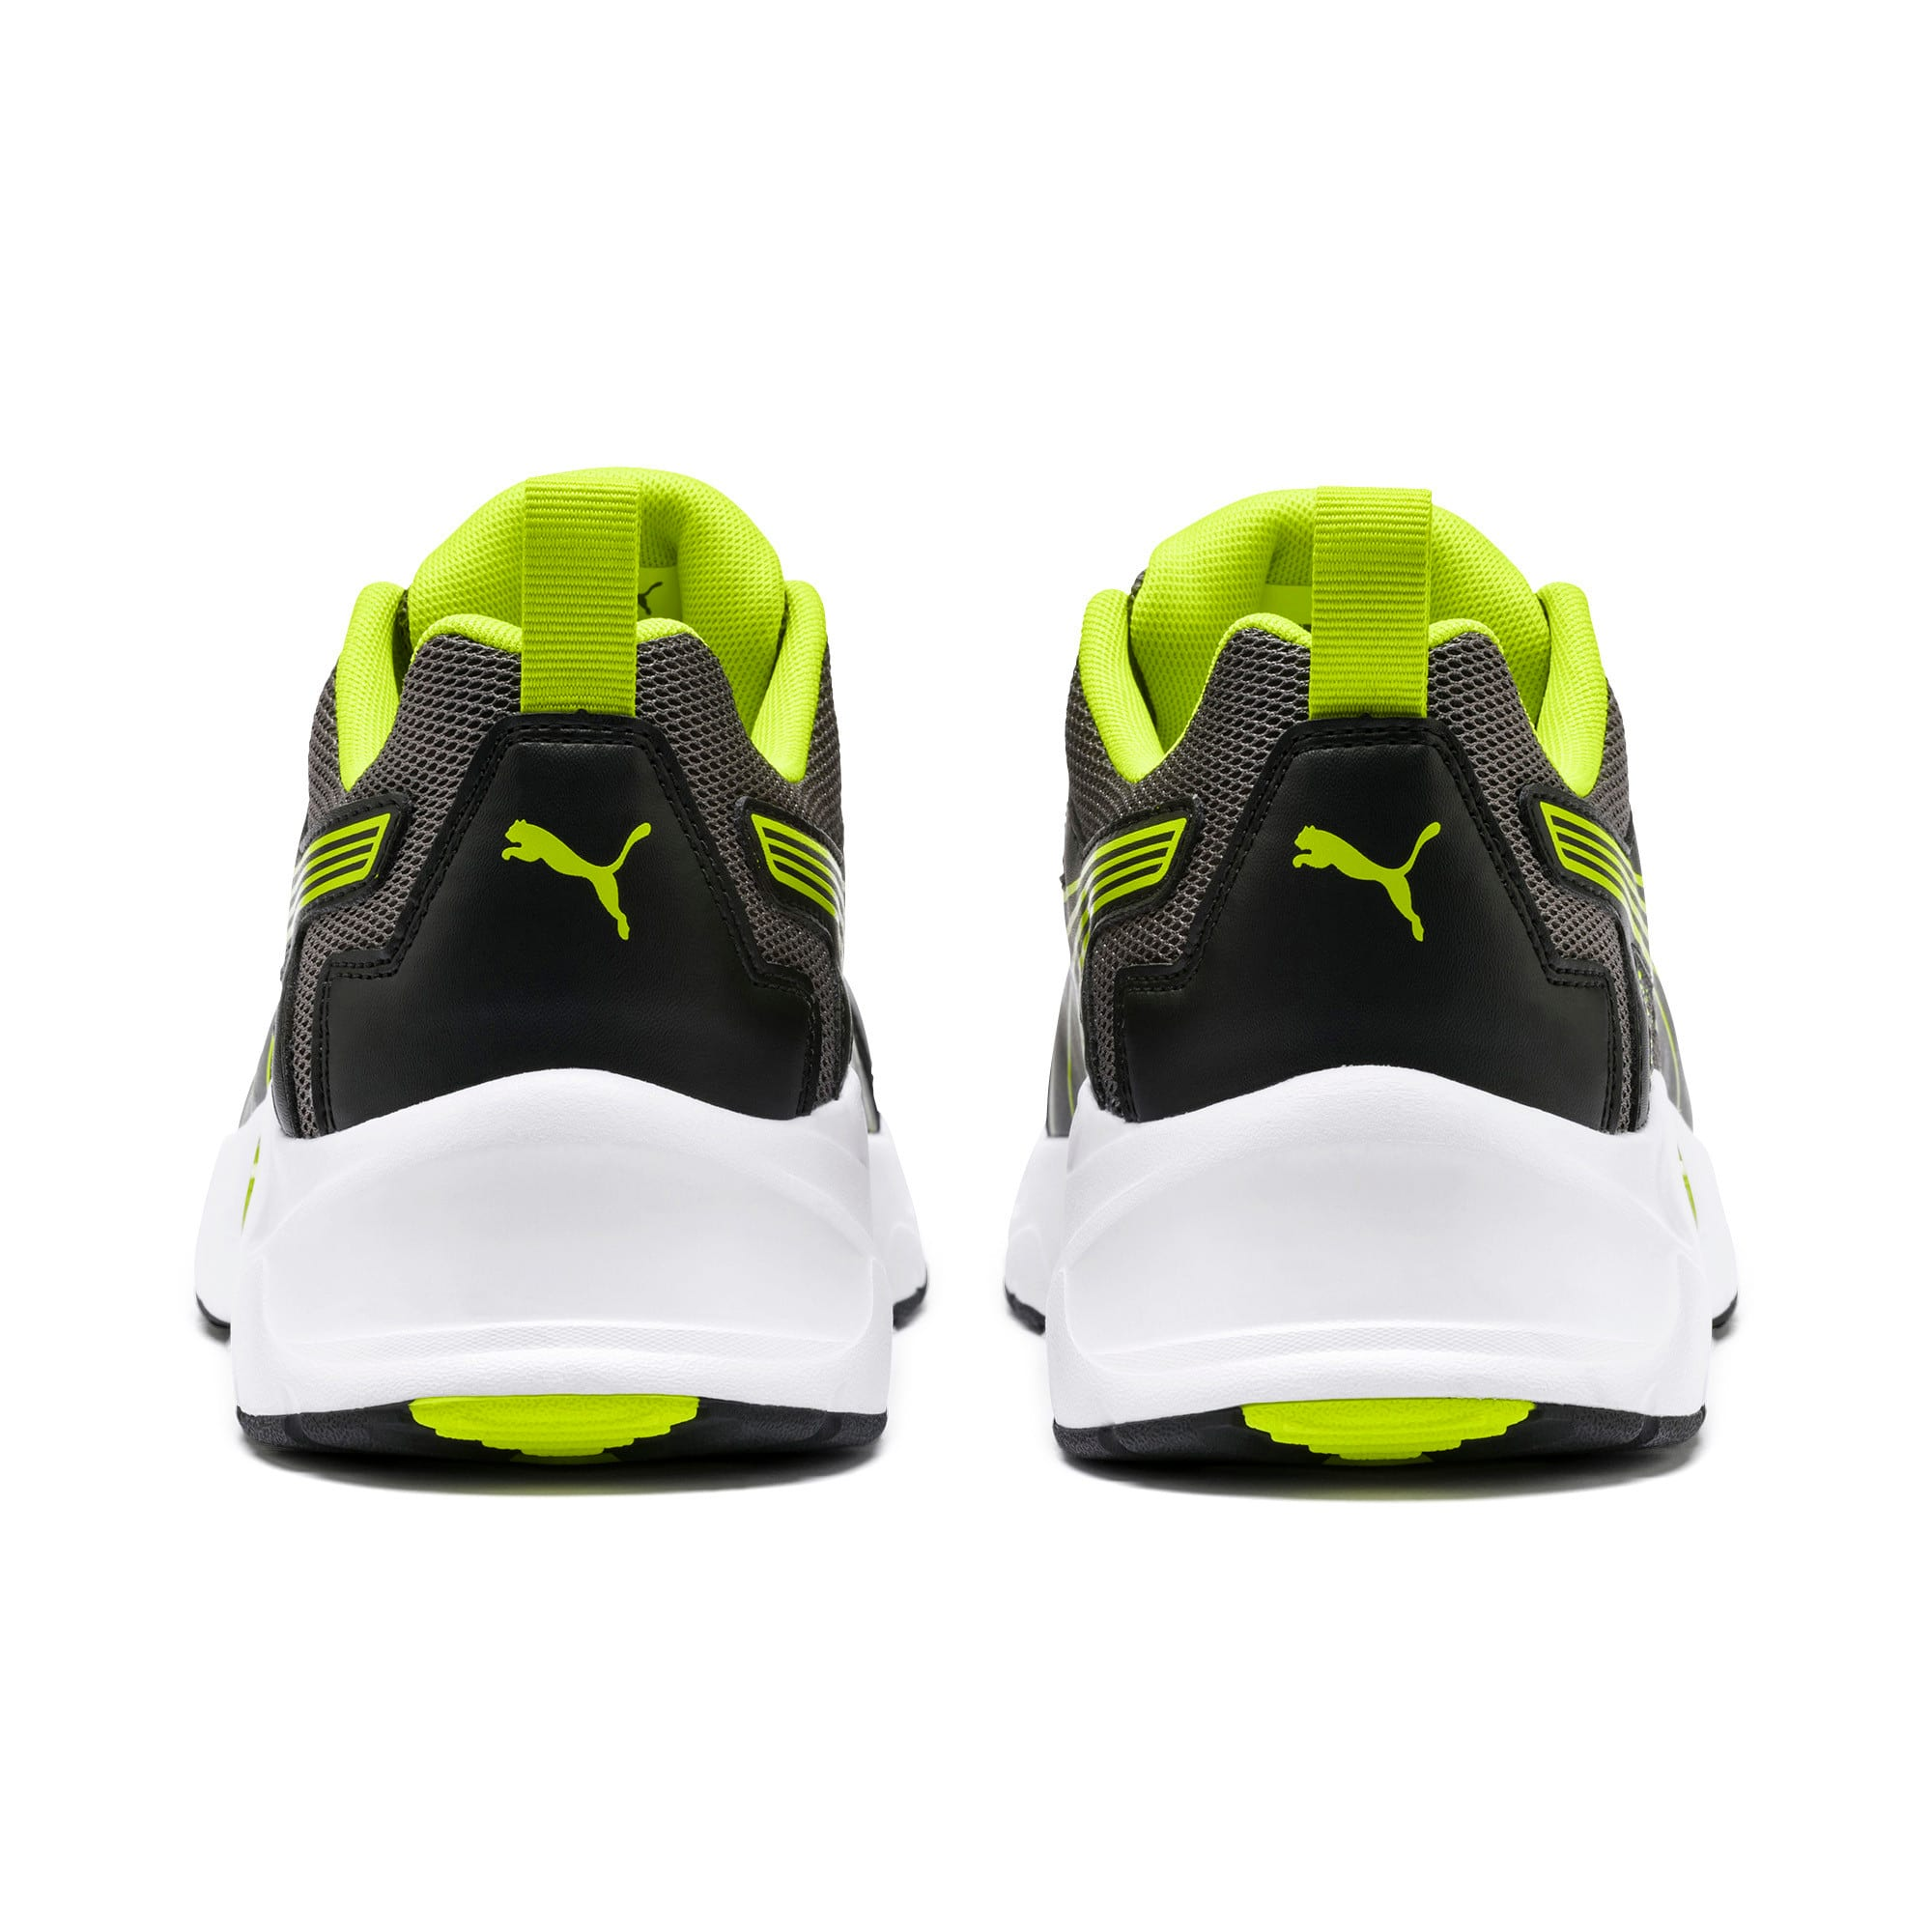 Thumbnail 4 of Nucleus Run Training Shoes, CASTLEROCK-Limepunch, medium